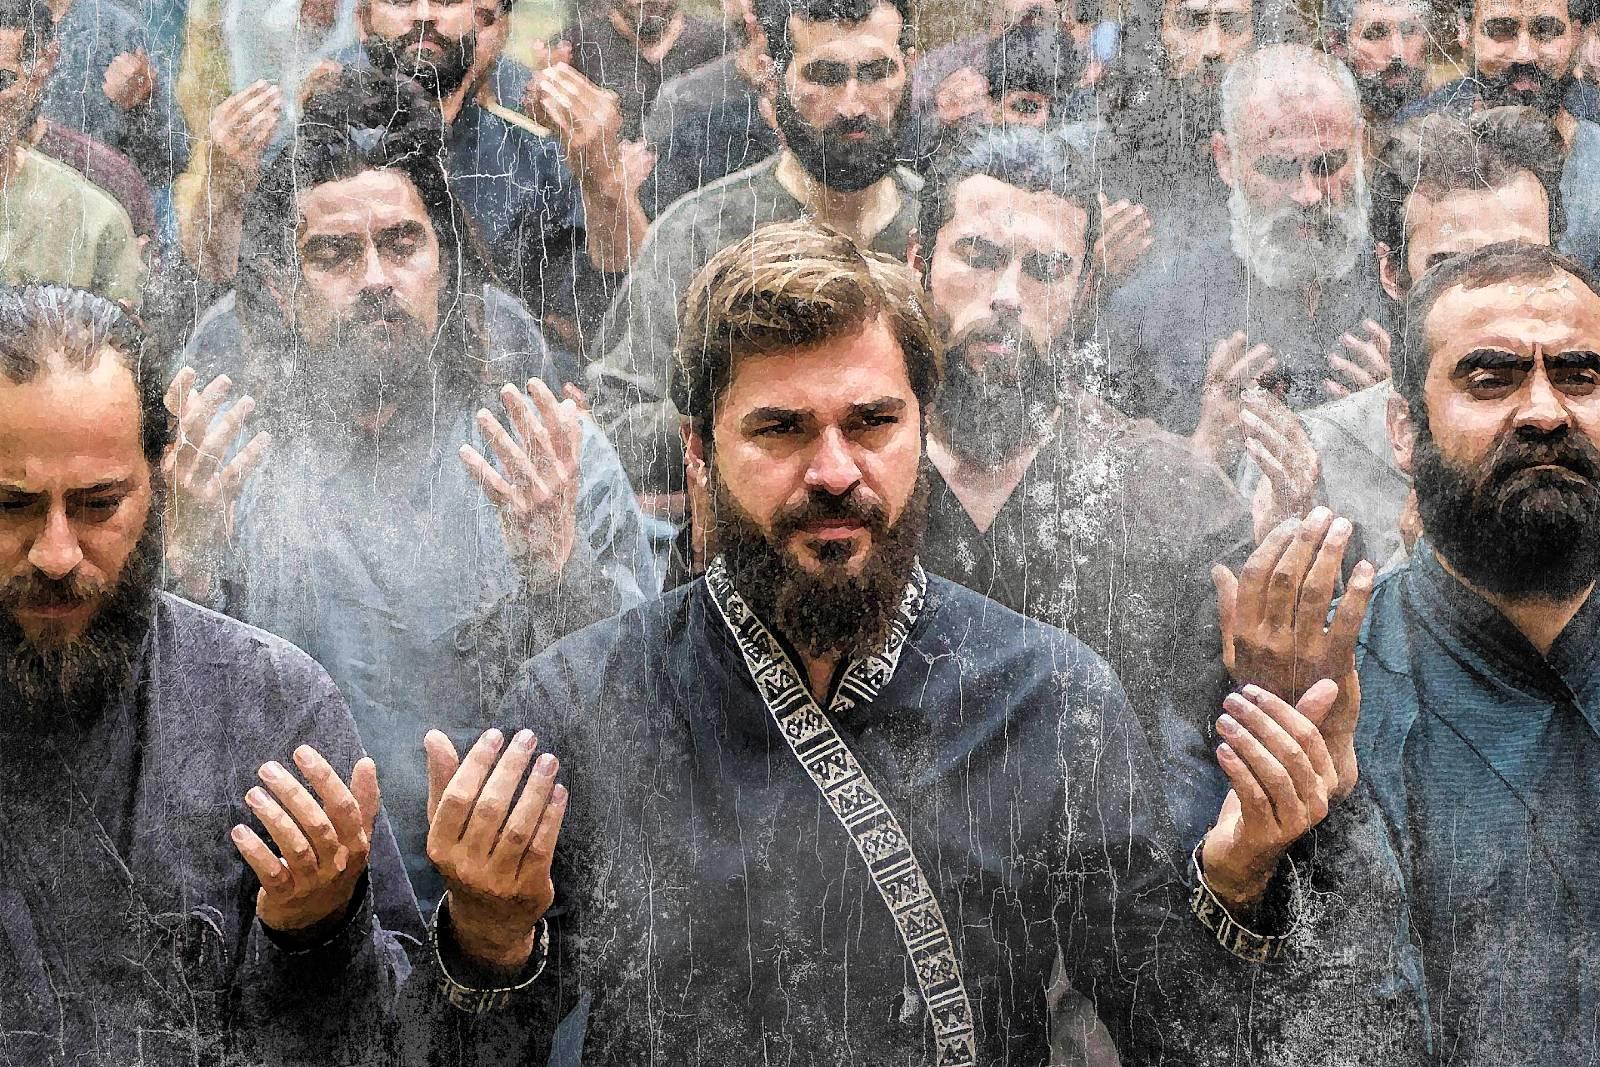 www.middleeasteye.net: How Ertugrul resurrected the Muslim imagination